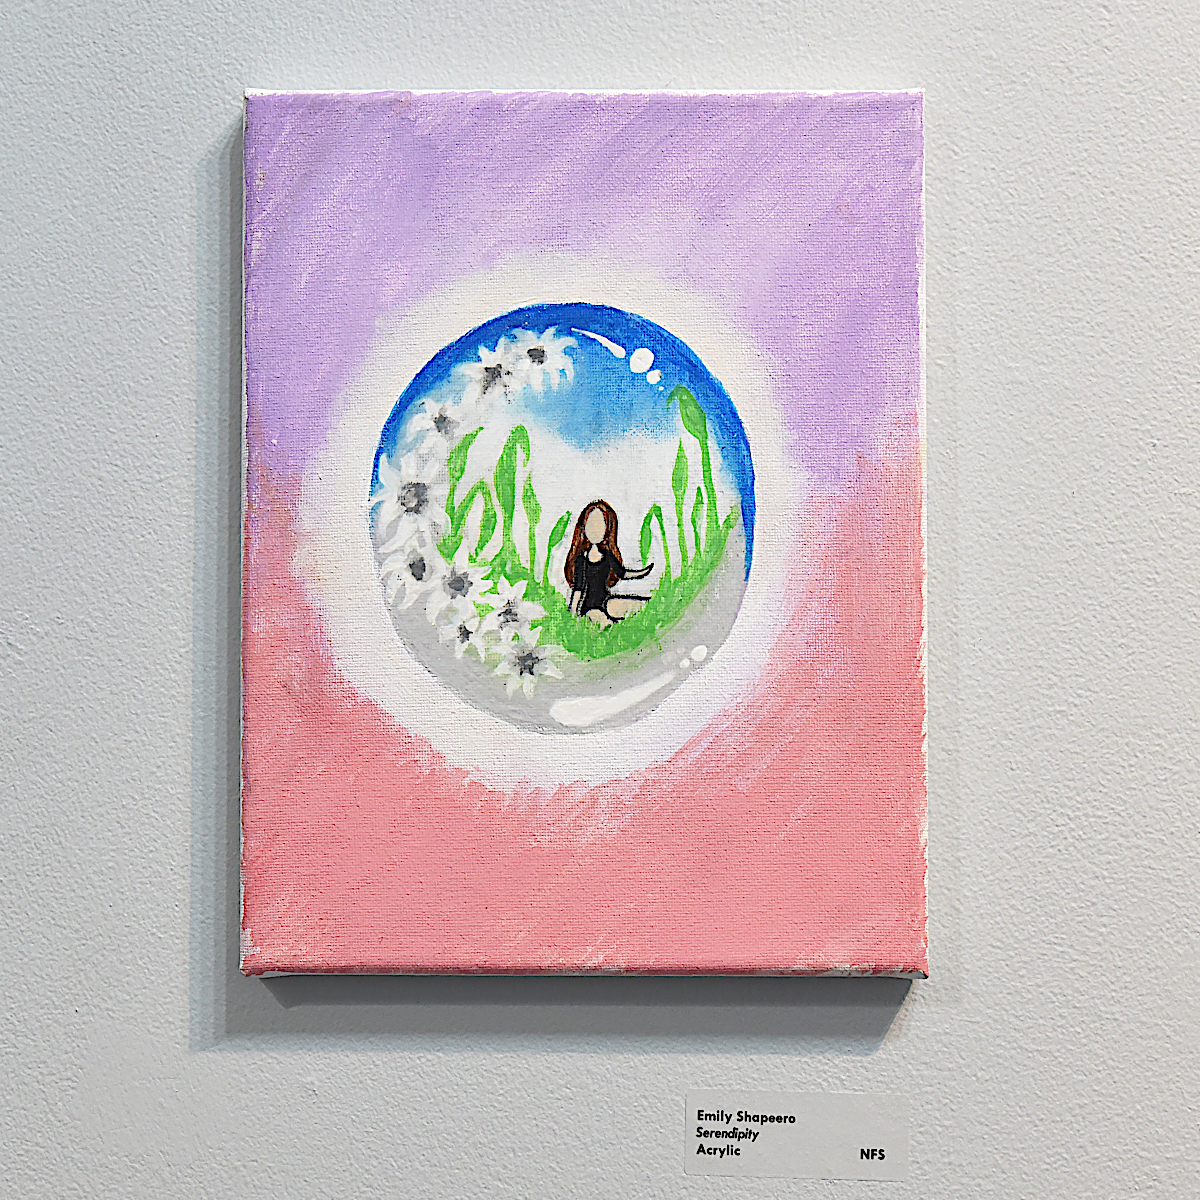 Emily Shapeero -- Serendipity